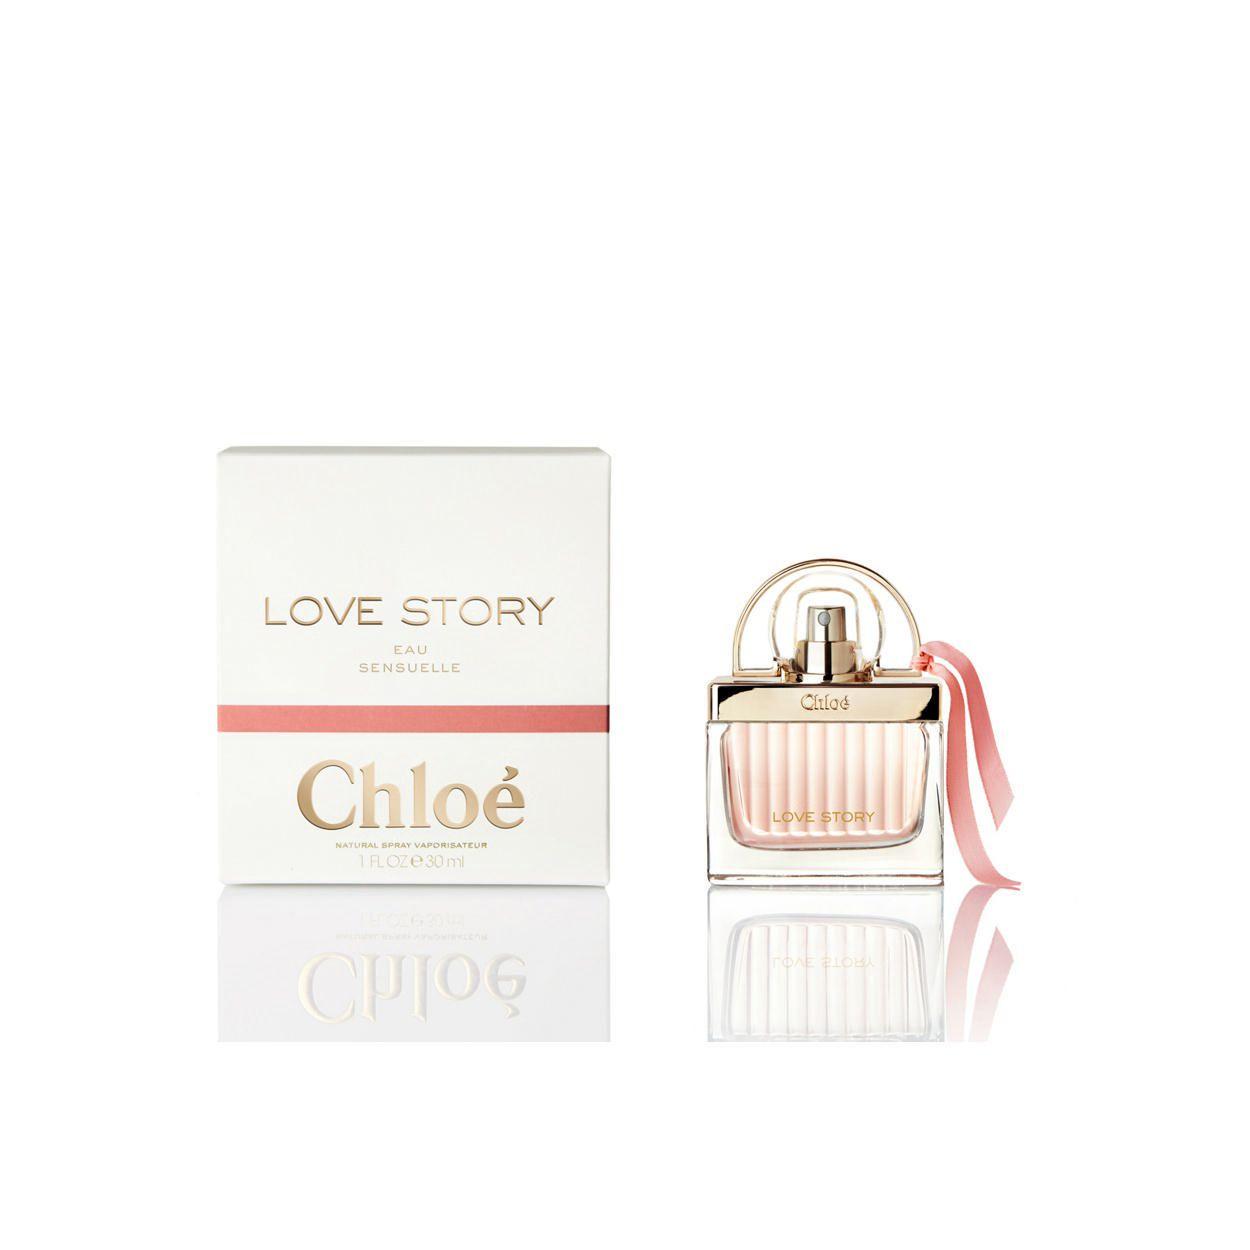 Parfum SprayWalmart De Chloe Love Canada Story 50ml Eau Sensuelle tsChdQr